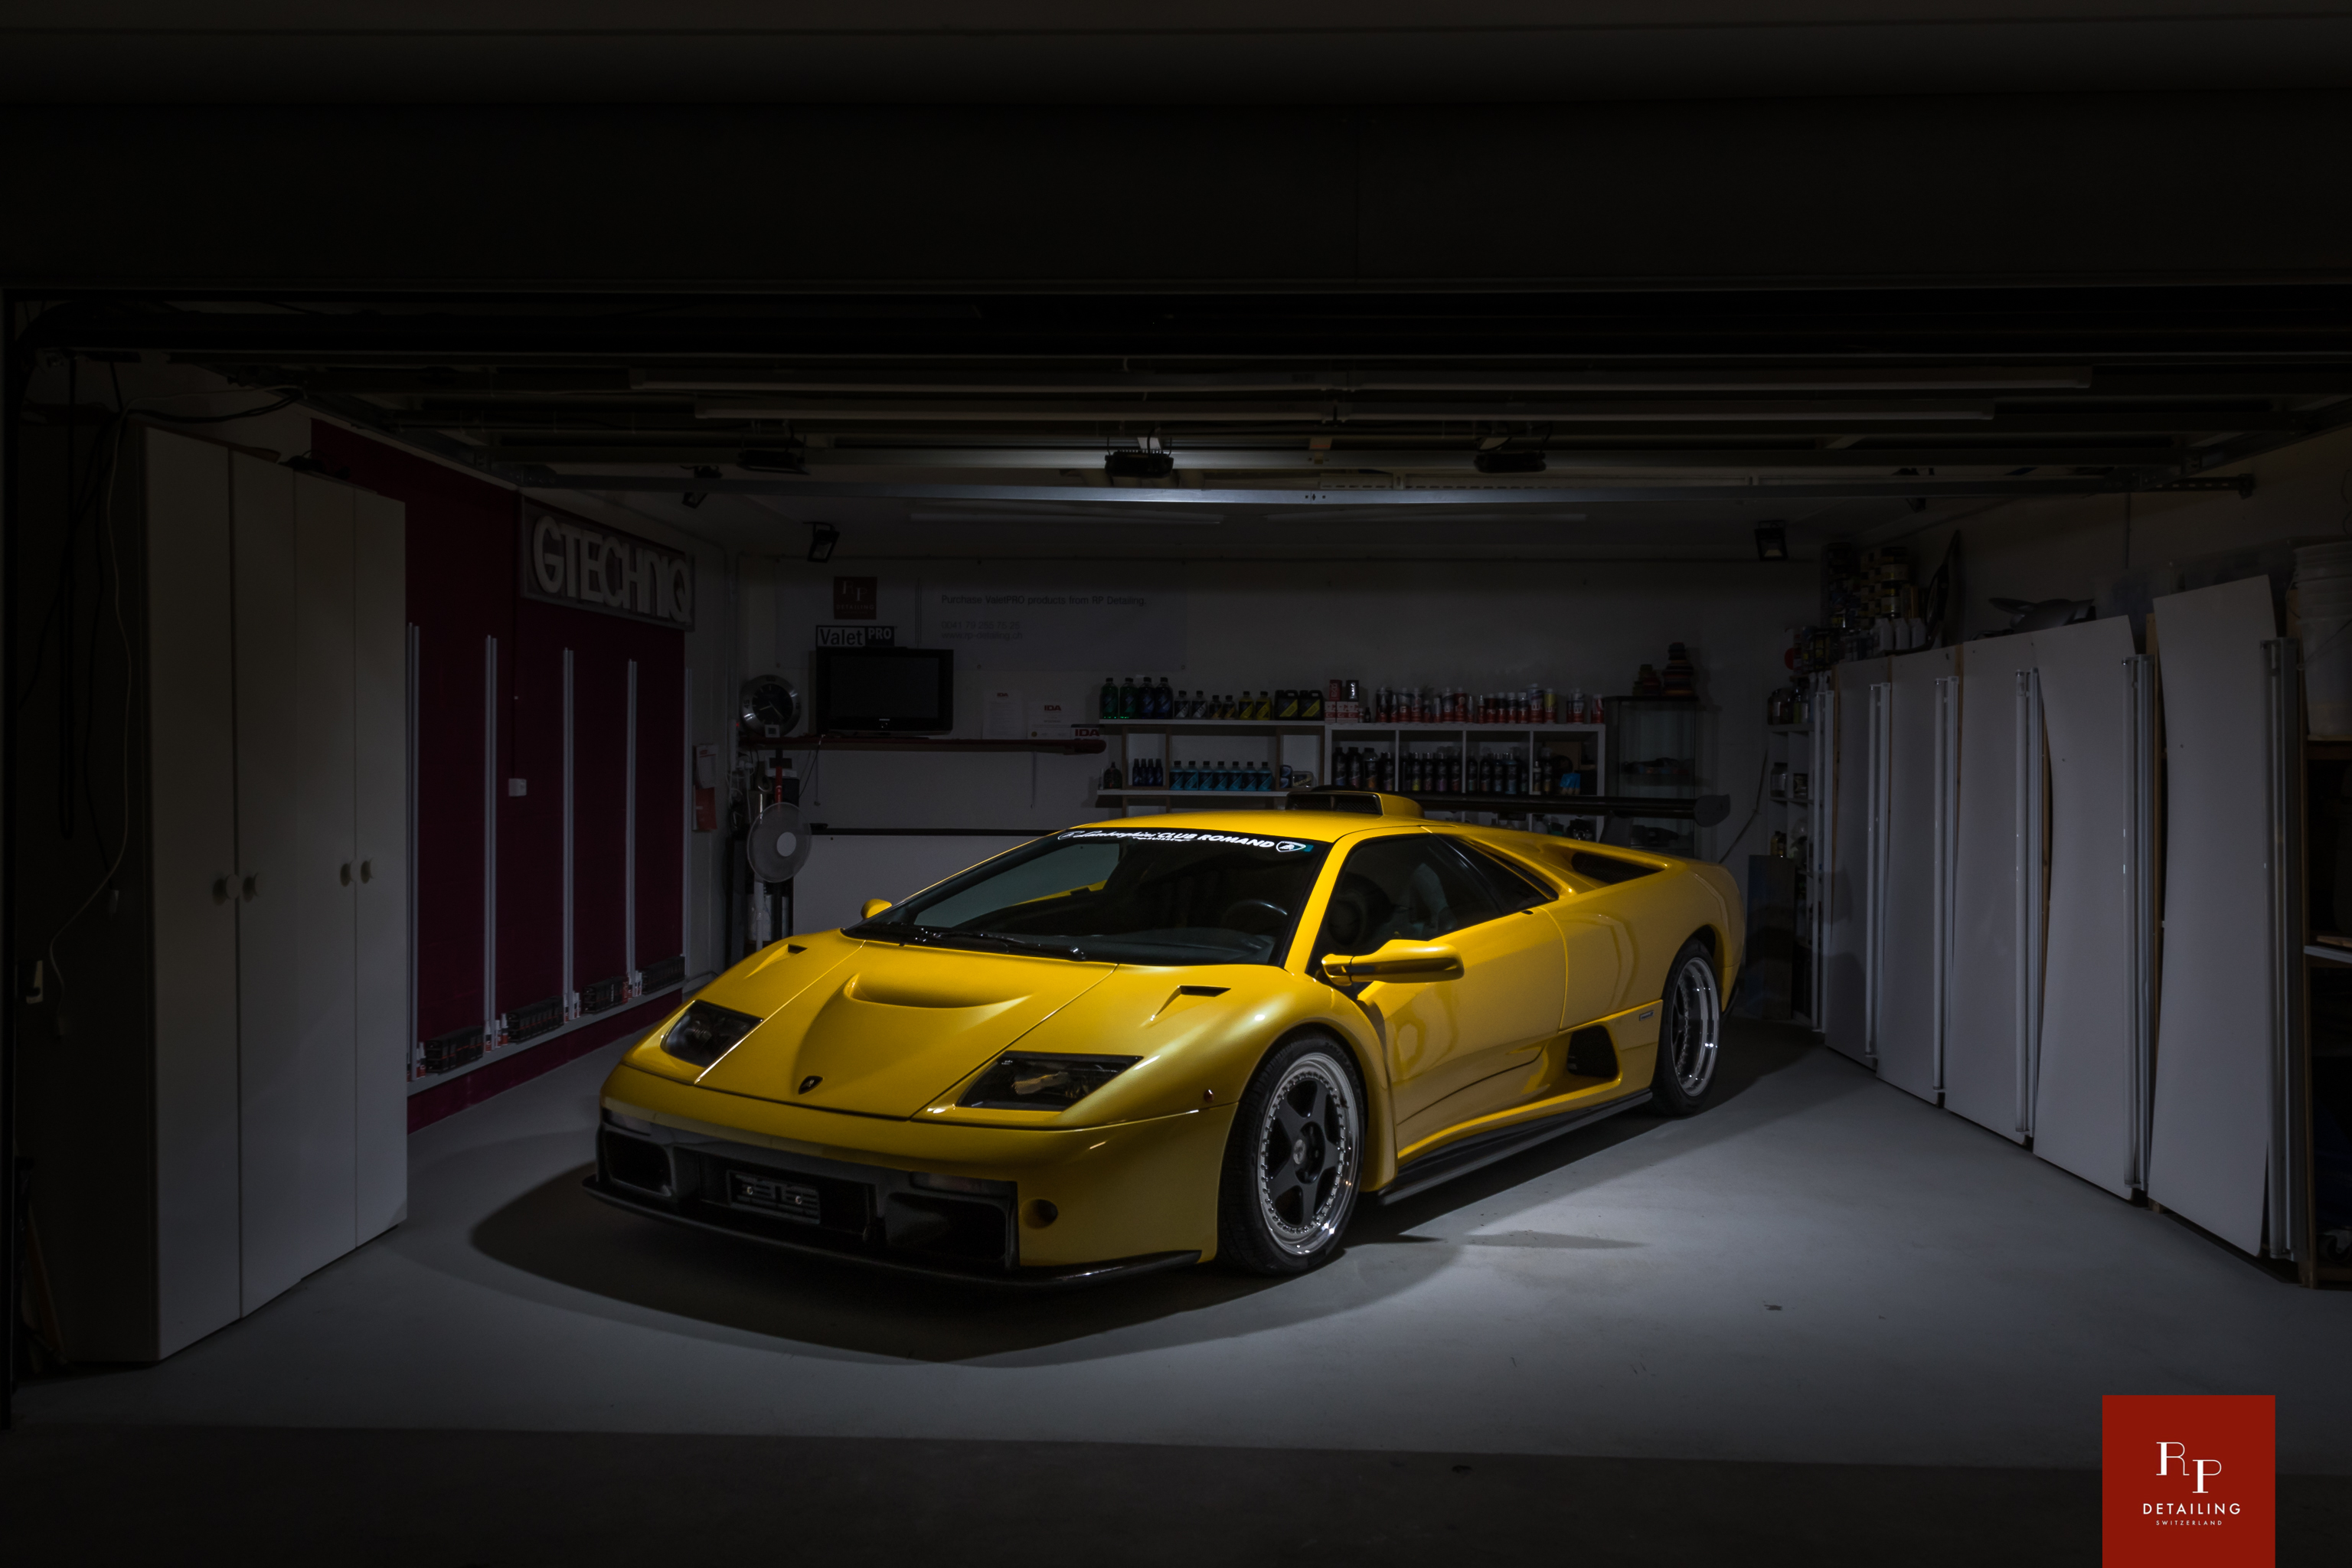 Lamborghini%20Diablo%20GT%20RP%2035.jpg